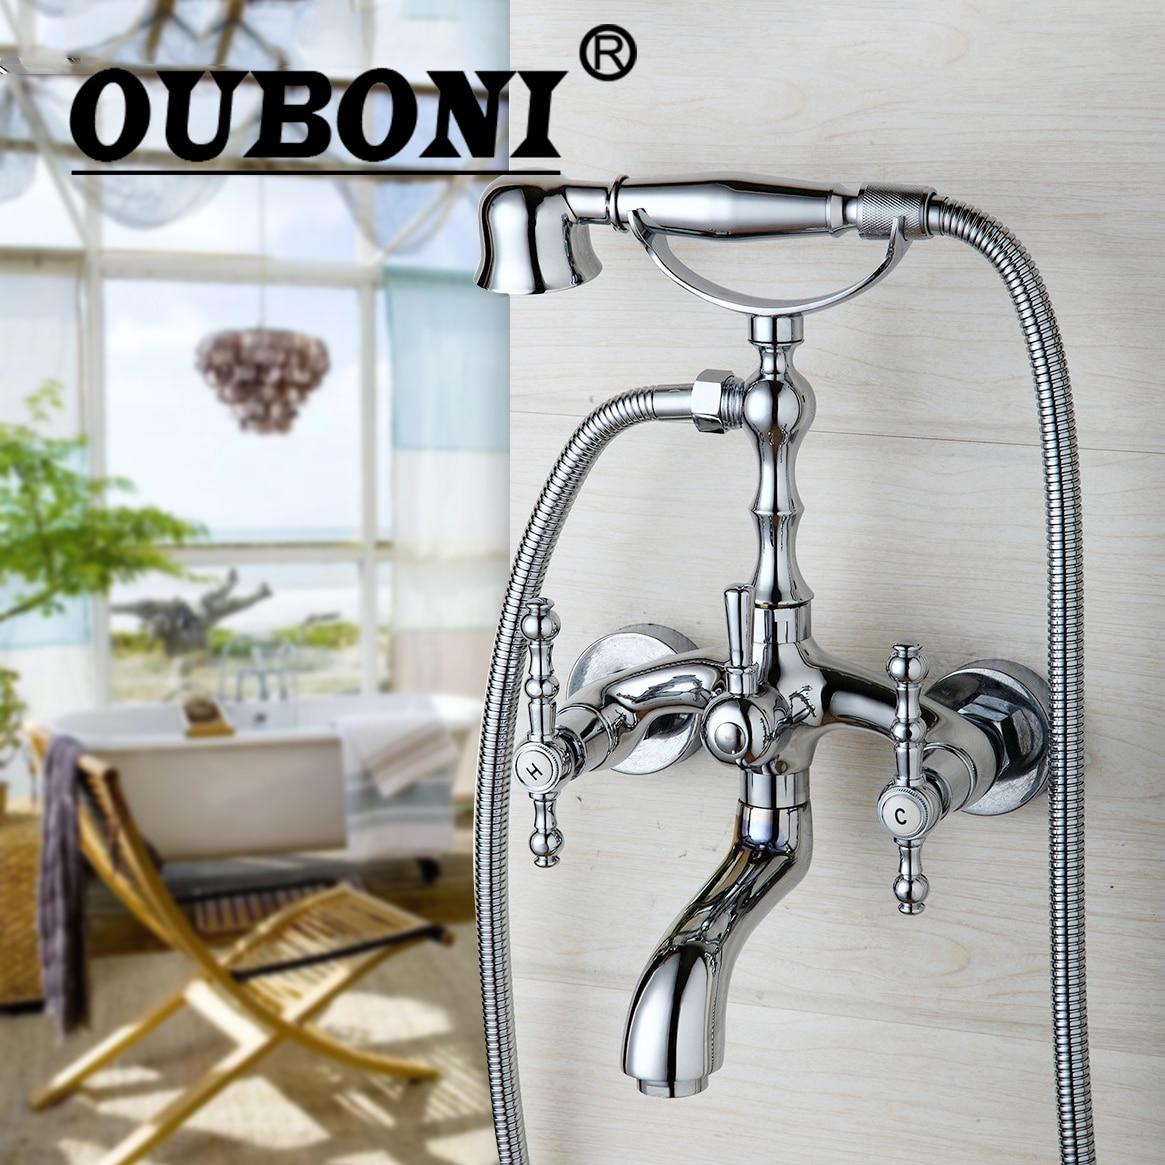 OUBONI Modern Rainfall & Stream Spout Wall Mounted Tap Chrome Finish Rain Shower Head Faucet Shower Set Hot & Cold Mixer